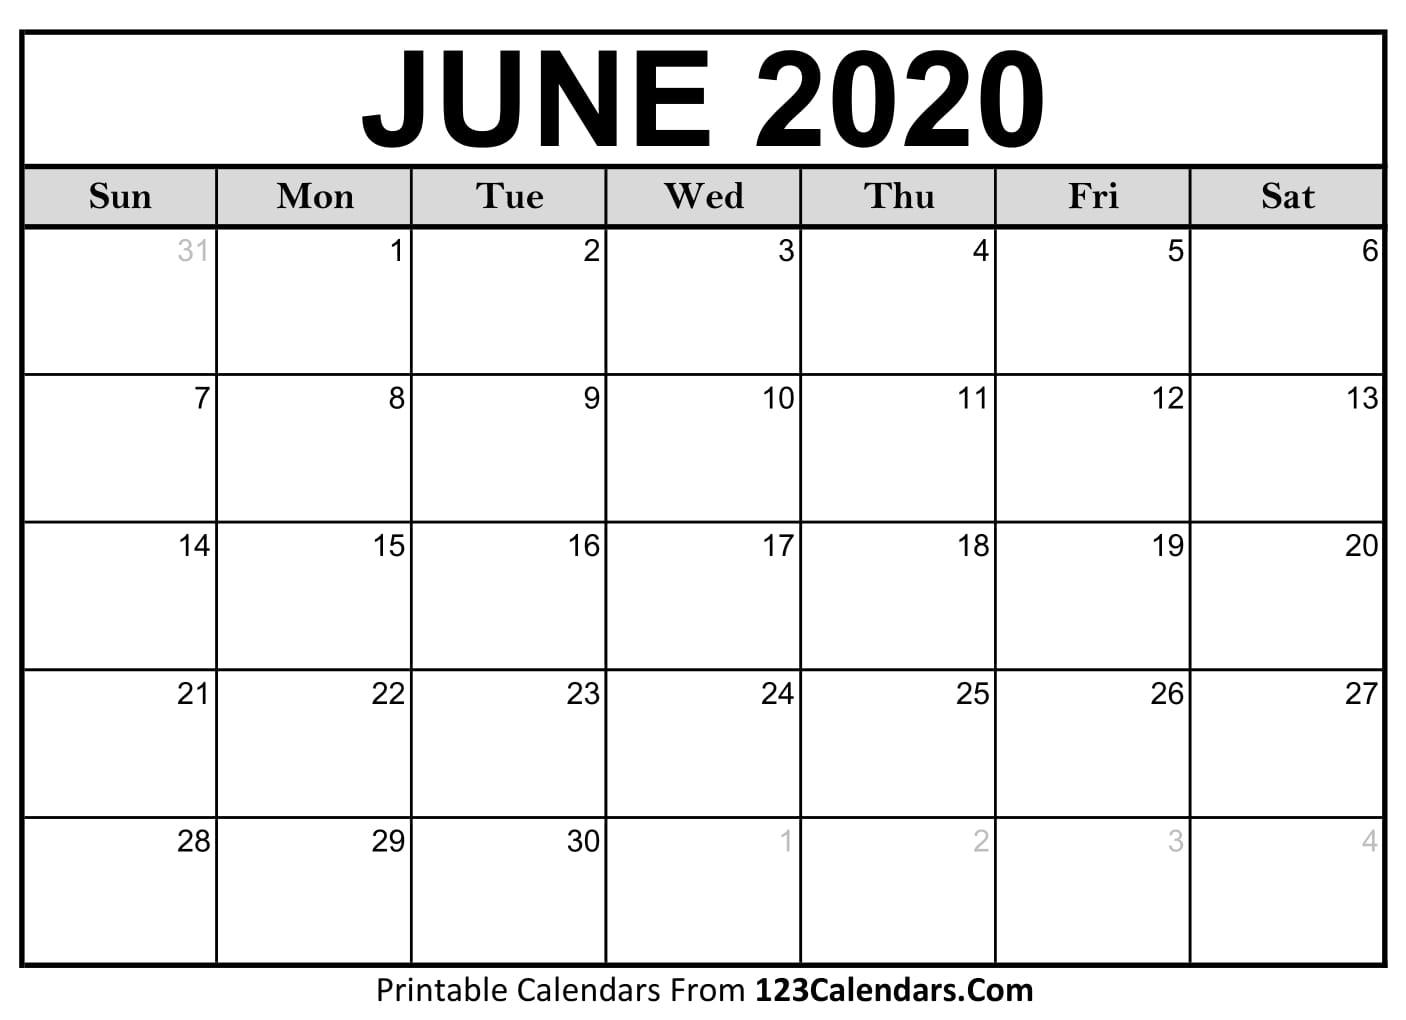 June 2020 Printable Calendar | 123Calendars with regard to 2020 Liturgical Calendar June 2020